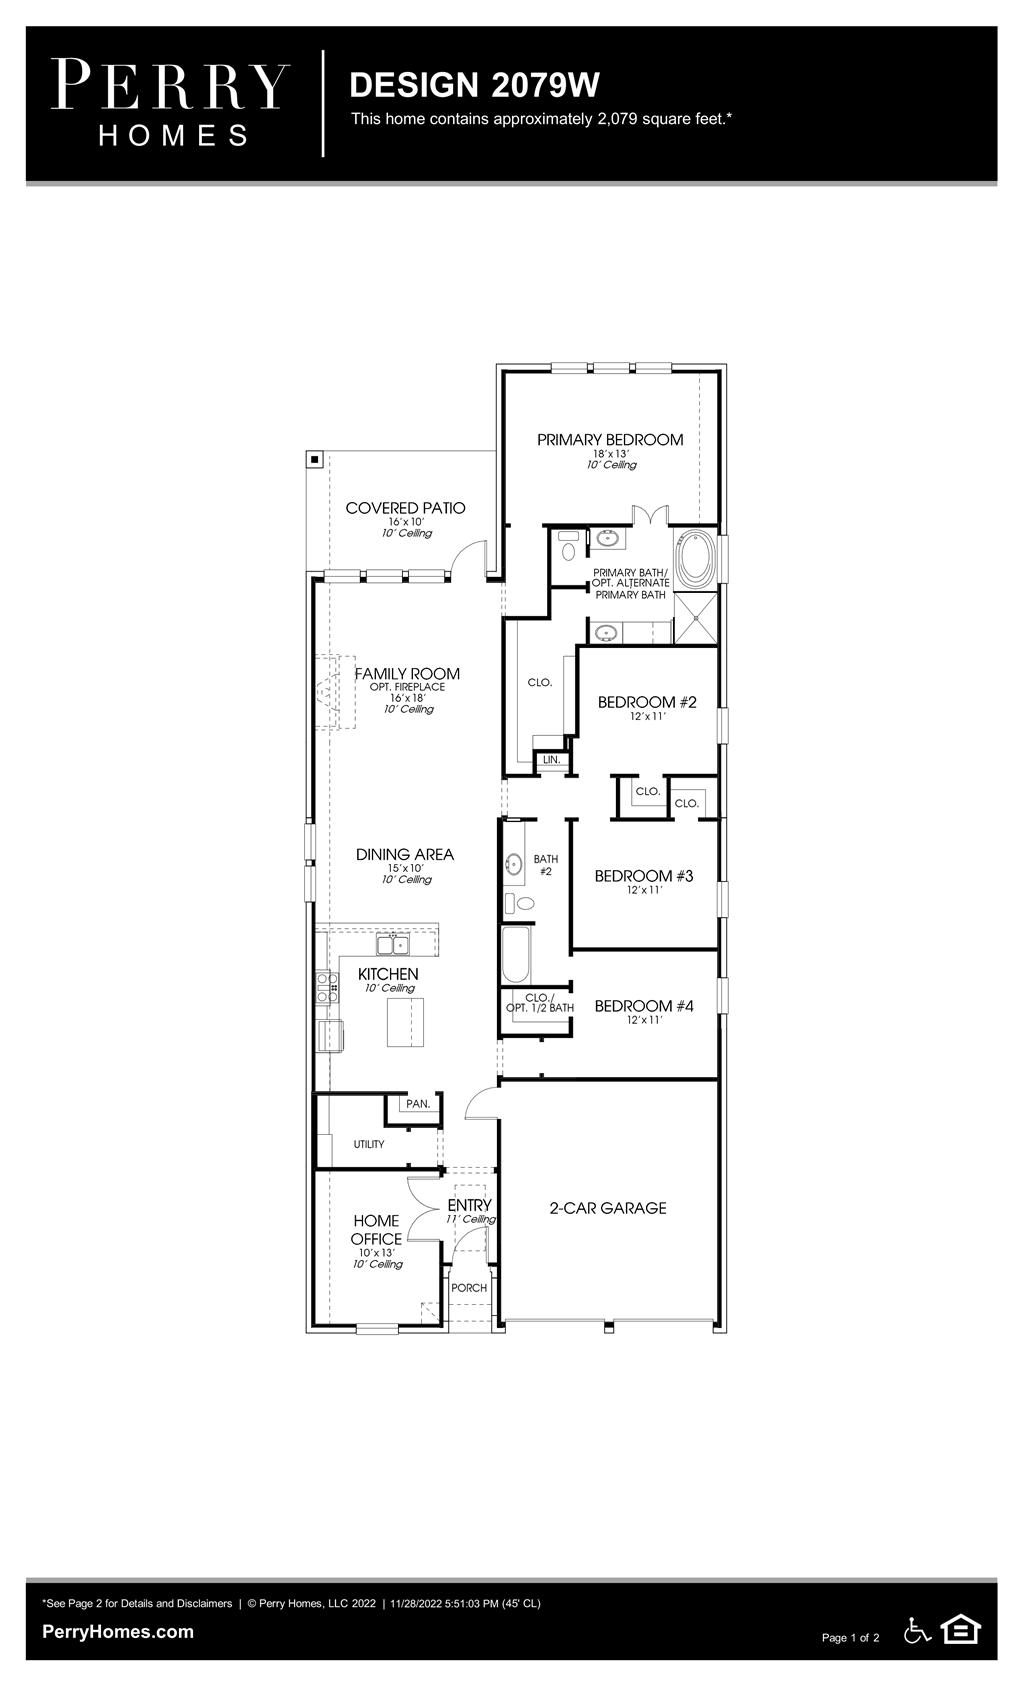 Floor Plan for 2079W